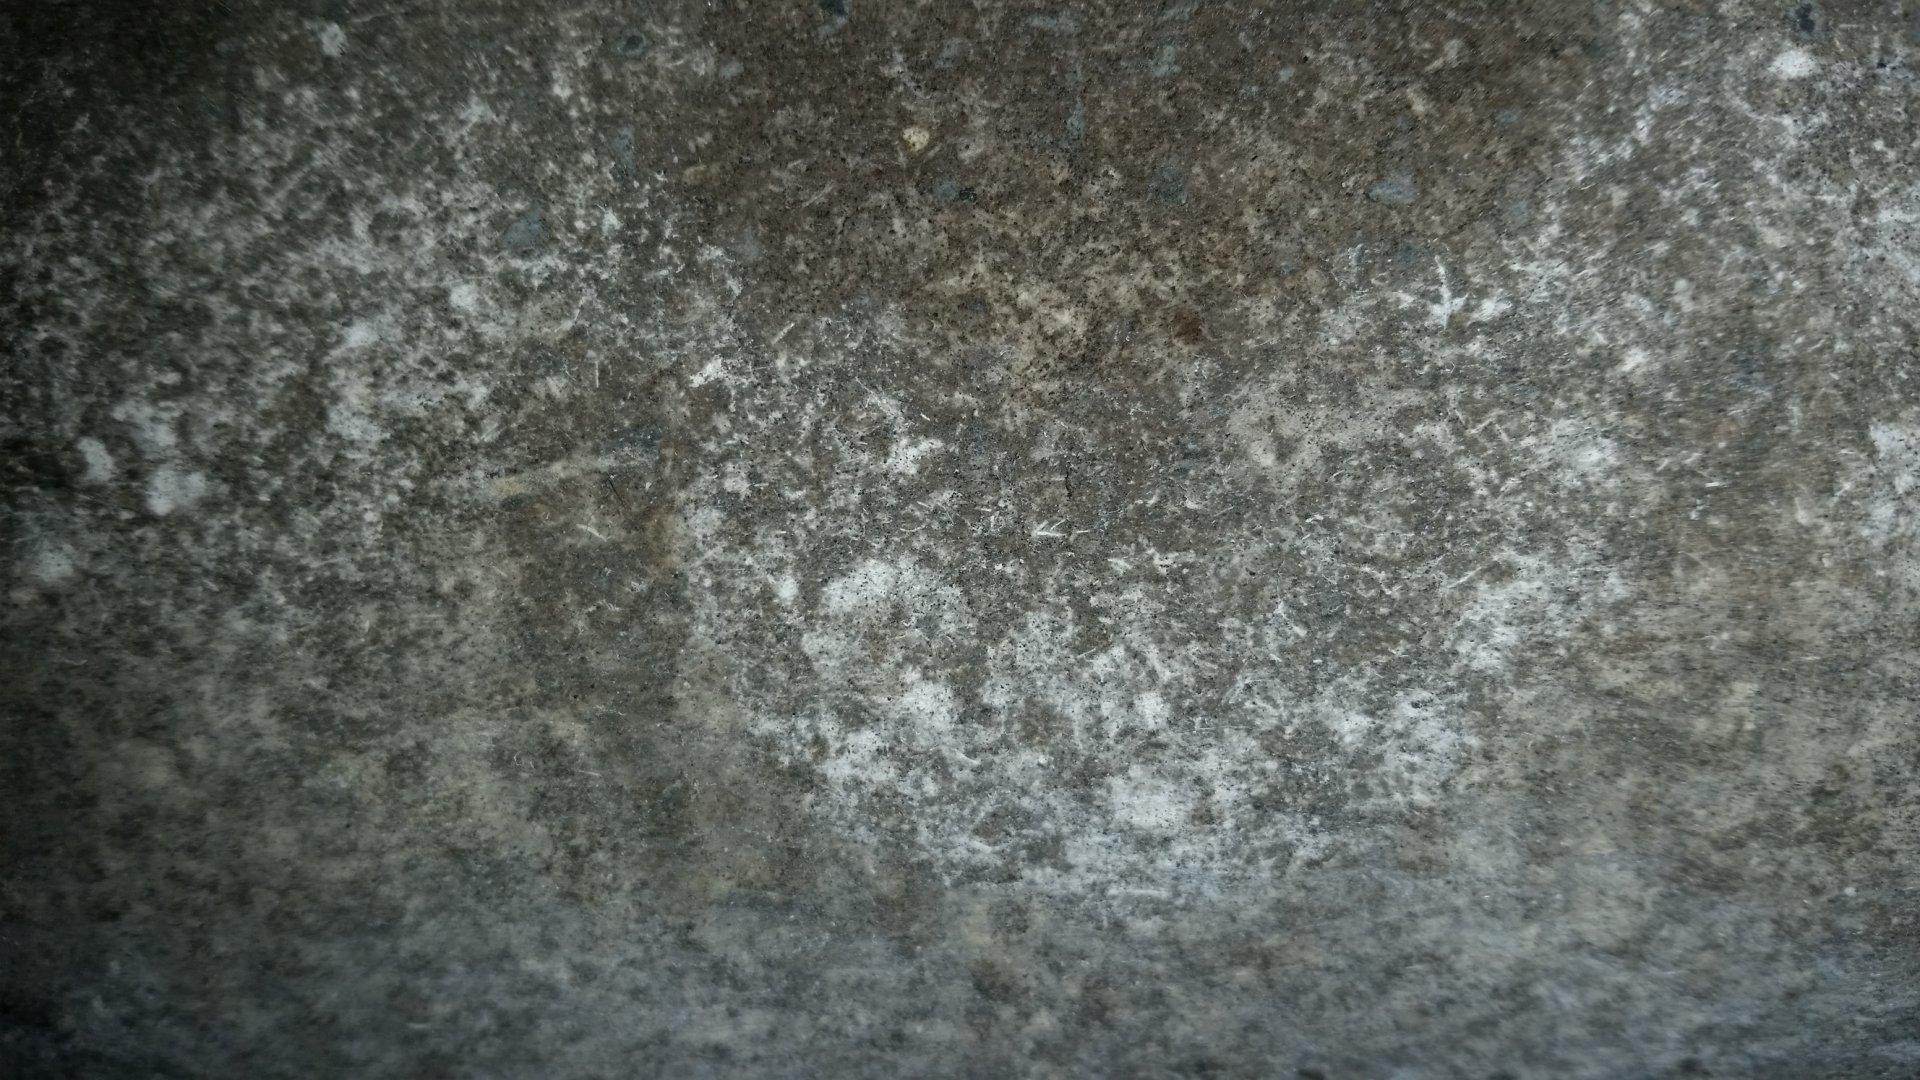 Häufig Eternit Wellplatten-Asbest freigesetzt? BL76